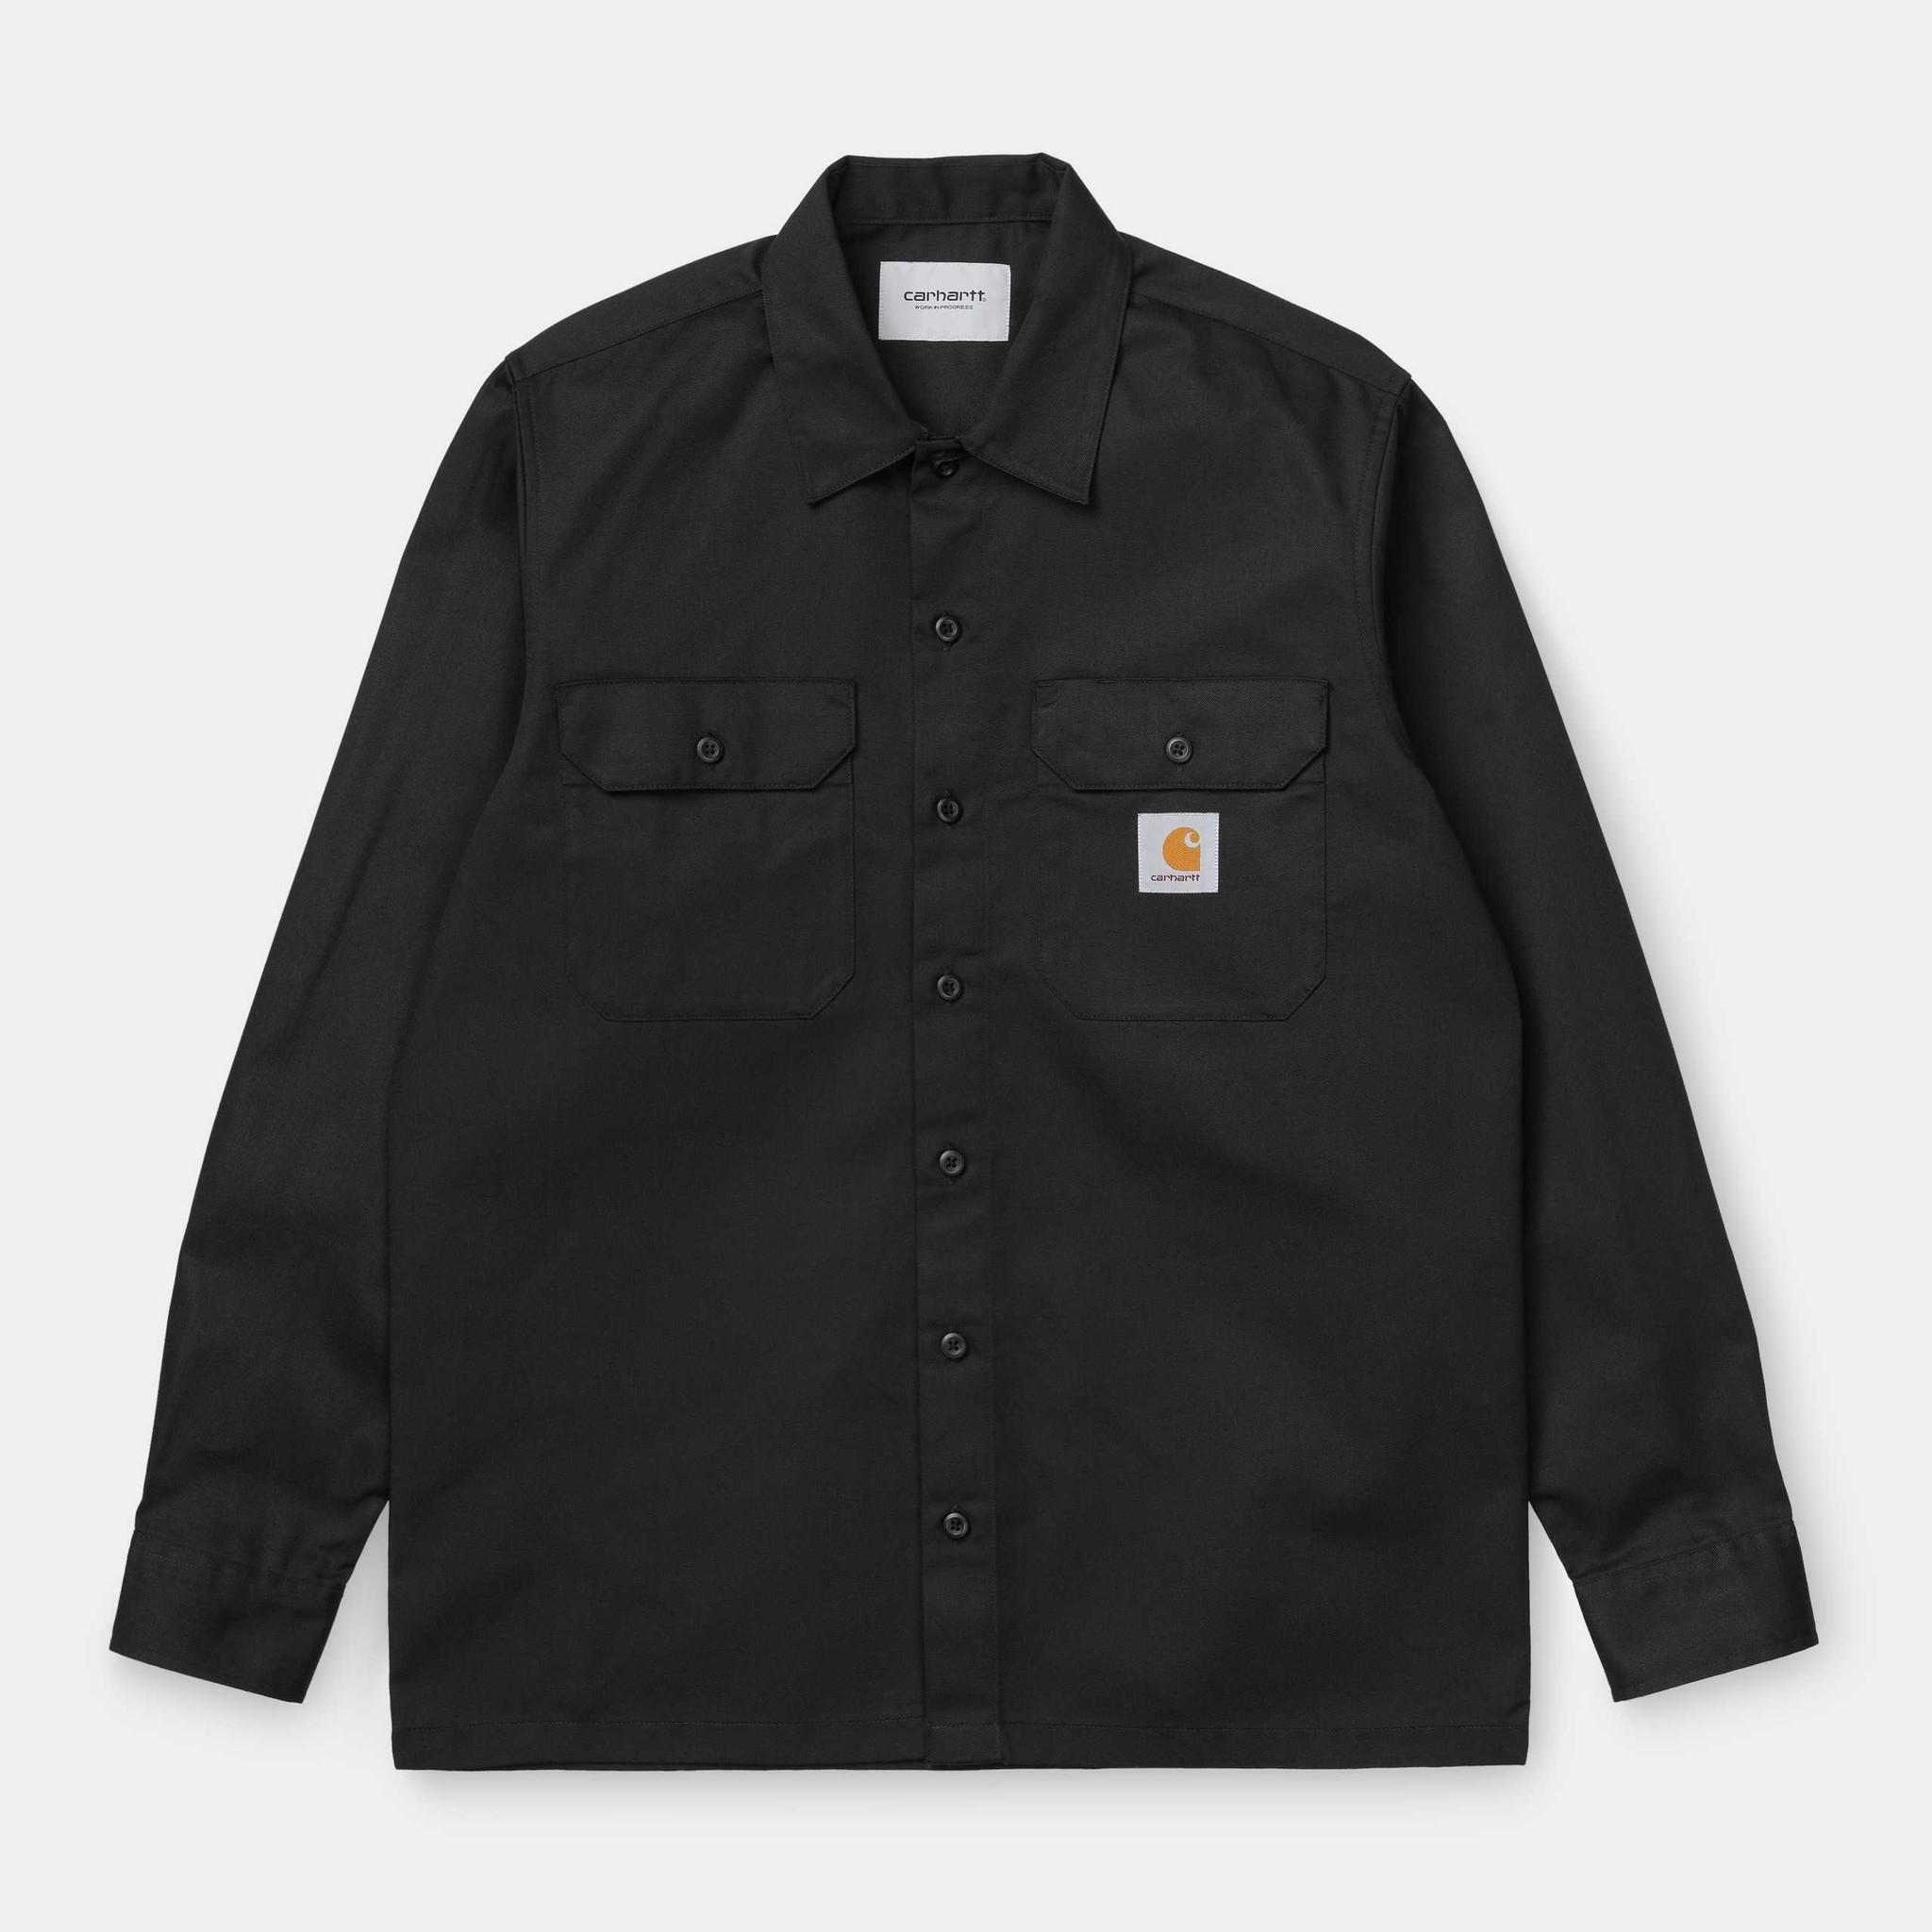 Carhartt Carhartt Master Shirt